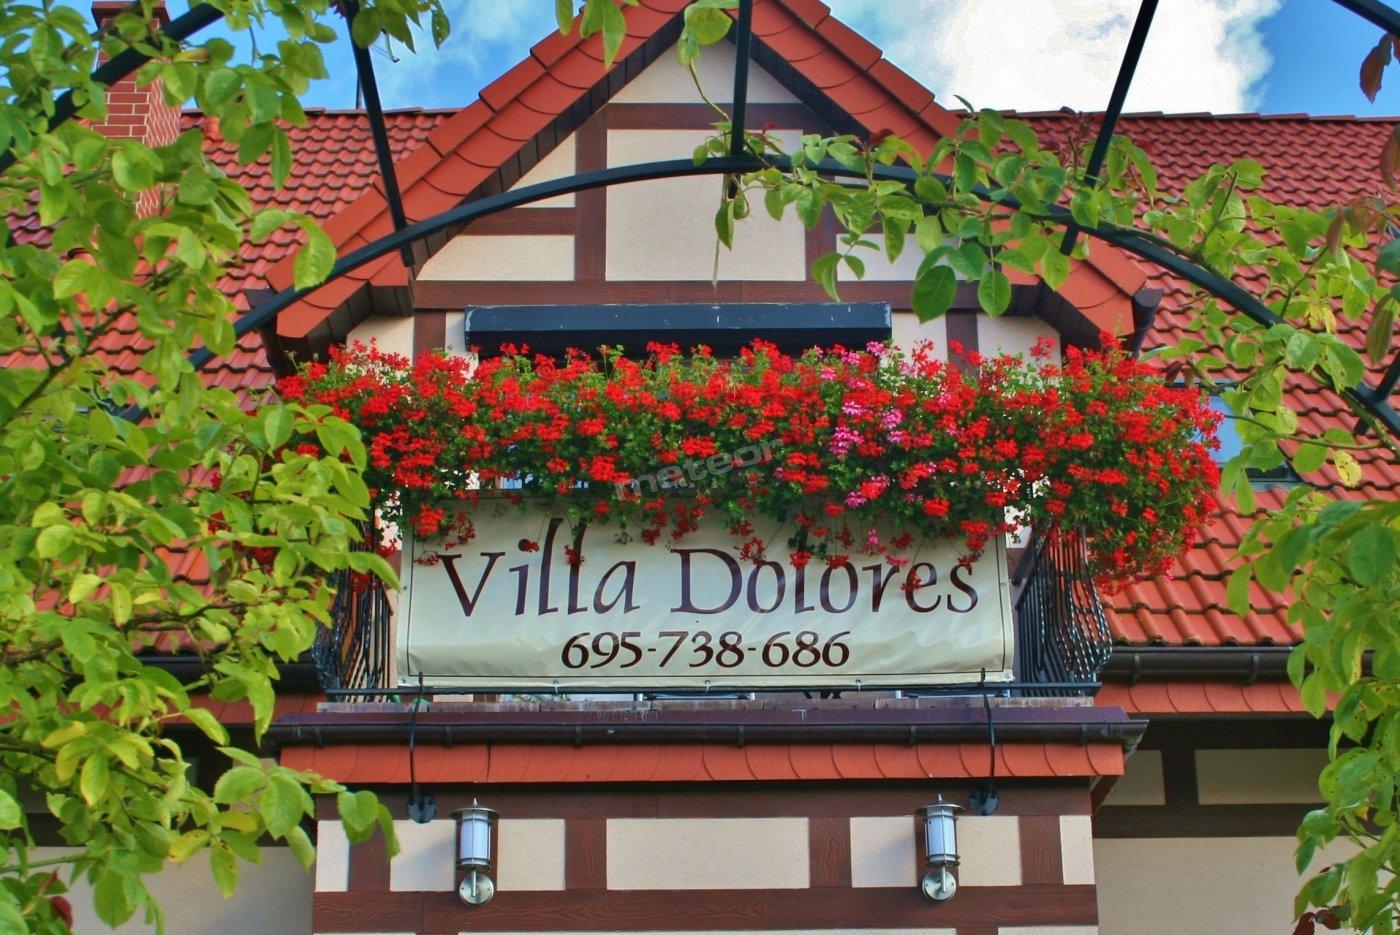 Villa Dolores Mielenko Pokoje Gościnne